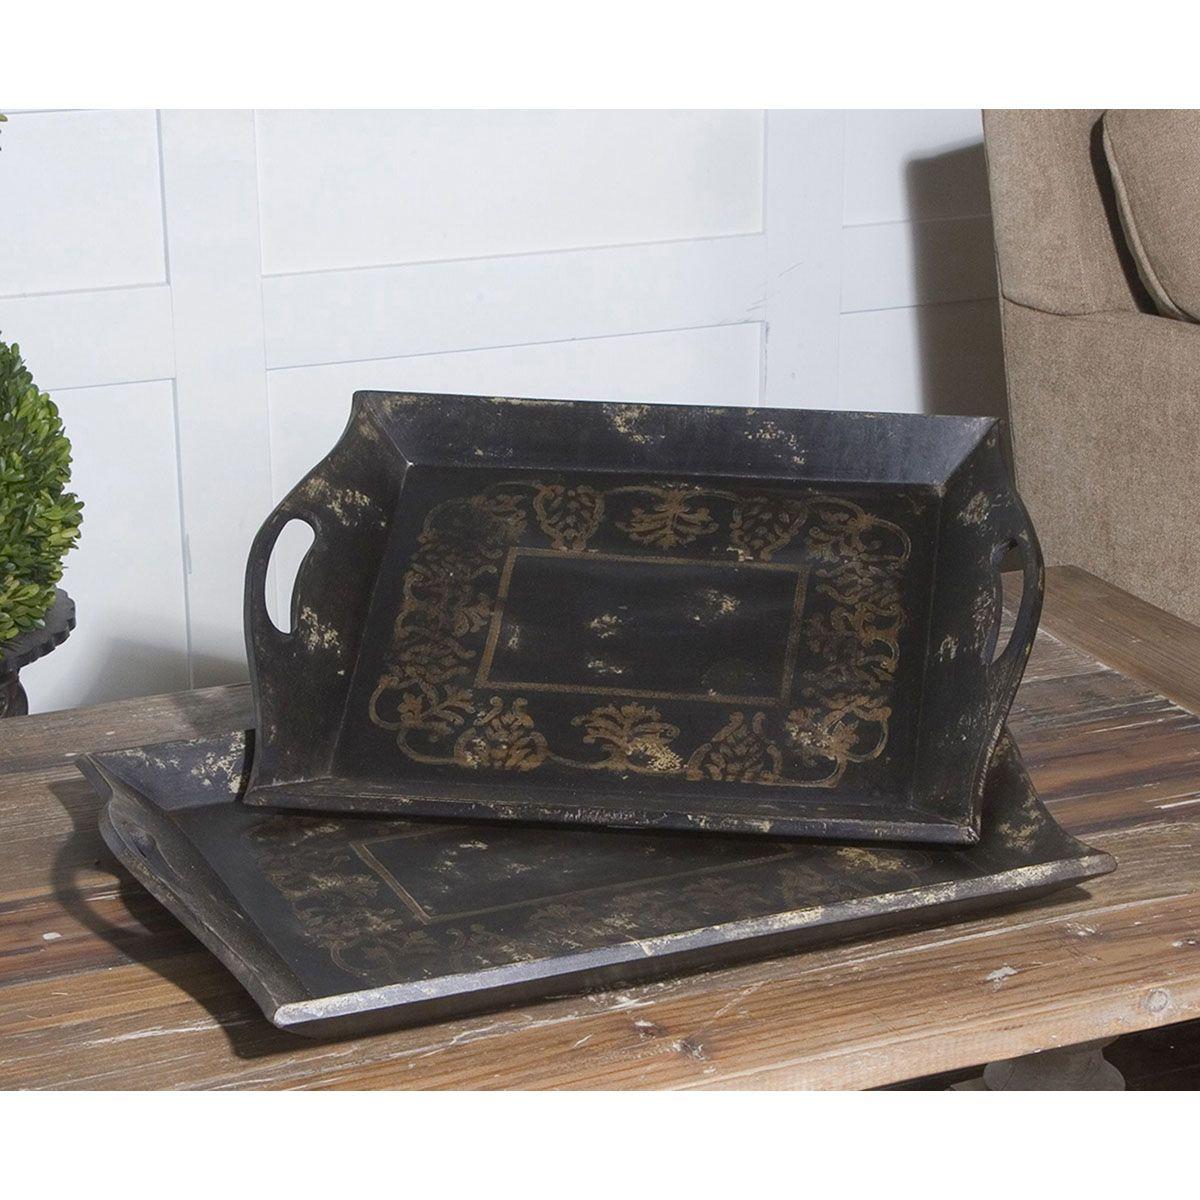 uttermost melani antique trays set of 2 19743 uttermost melani antique trays set of 2 19743   uttermost      rh   pinterest